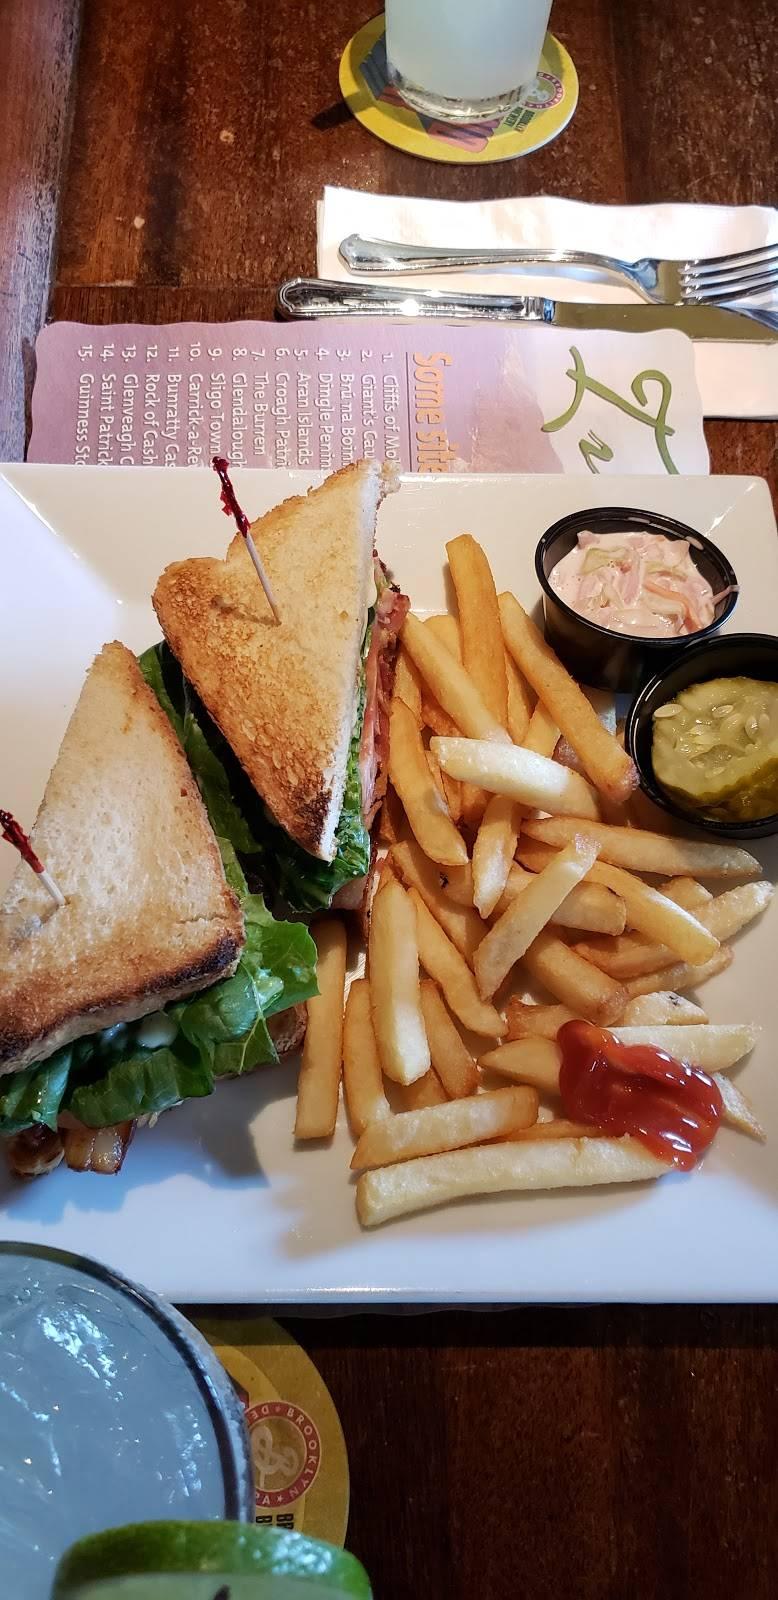 Blarney Station Pub   restaurant   258 Park Ave, East Rutherford, NJ 07073, USA   2015310001 OR +1 201-531-0001